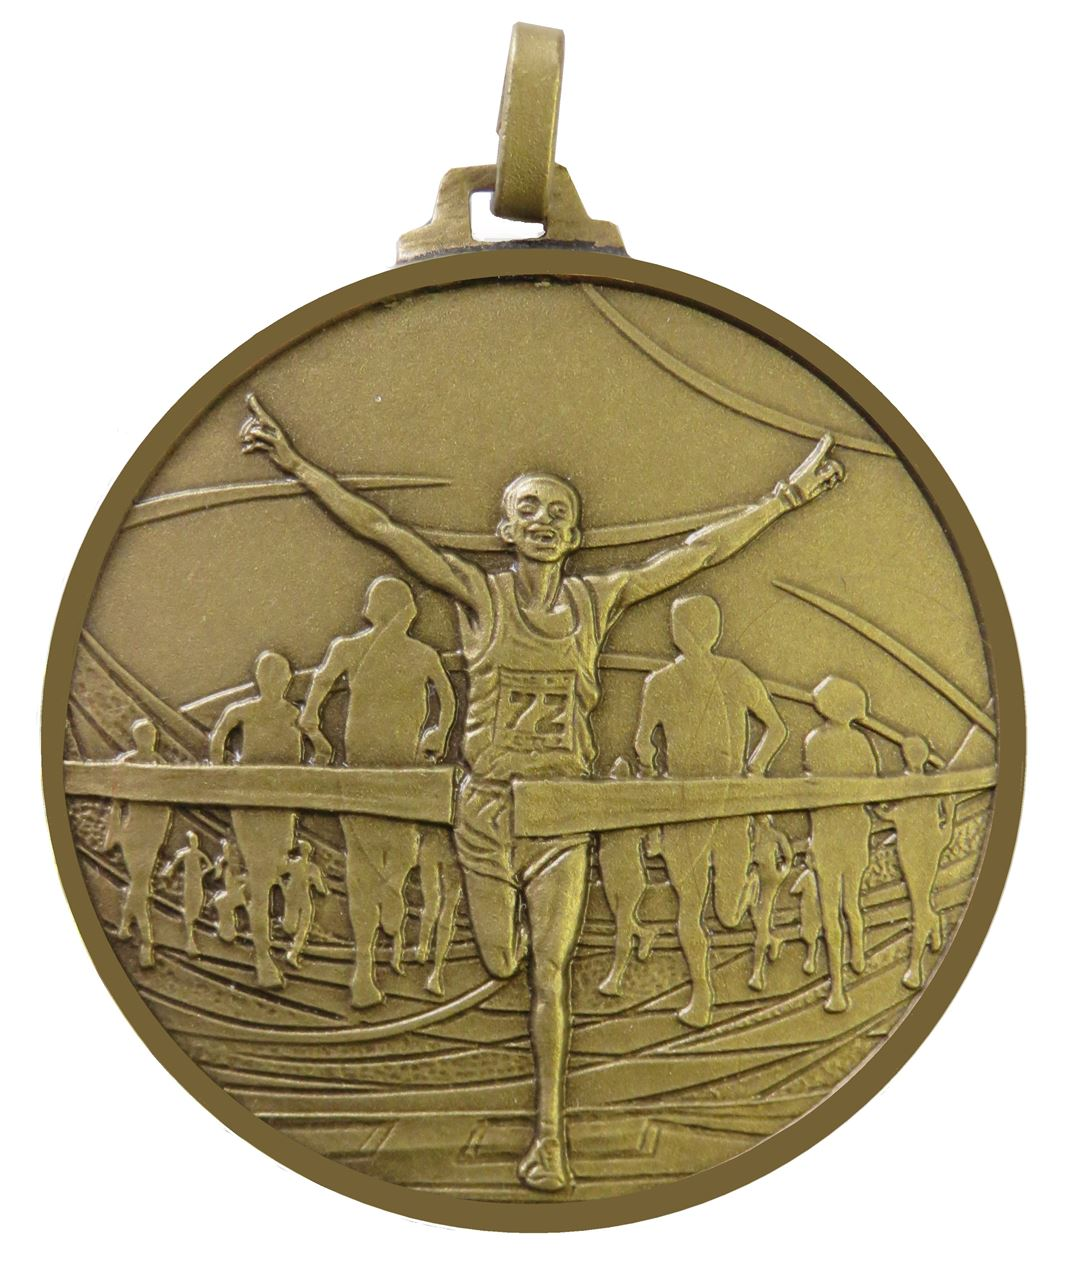 Bronze Faceted Winning Runner Medal (size: 52mm) - 438/52B